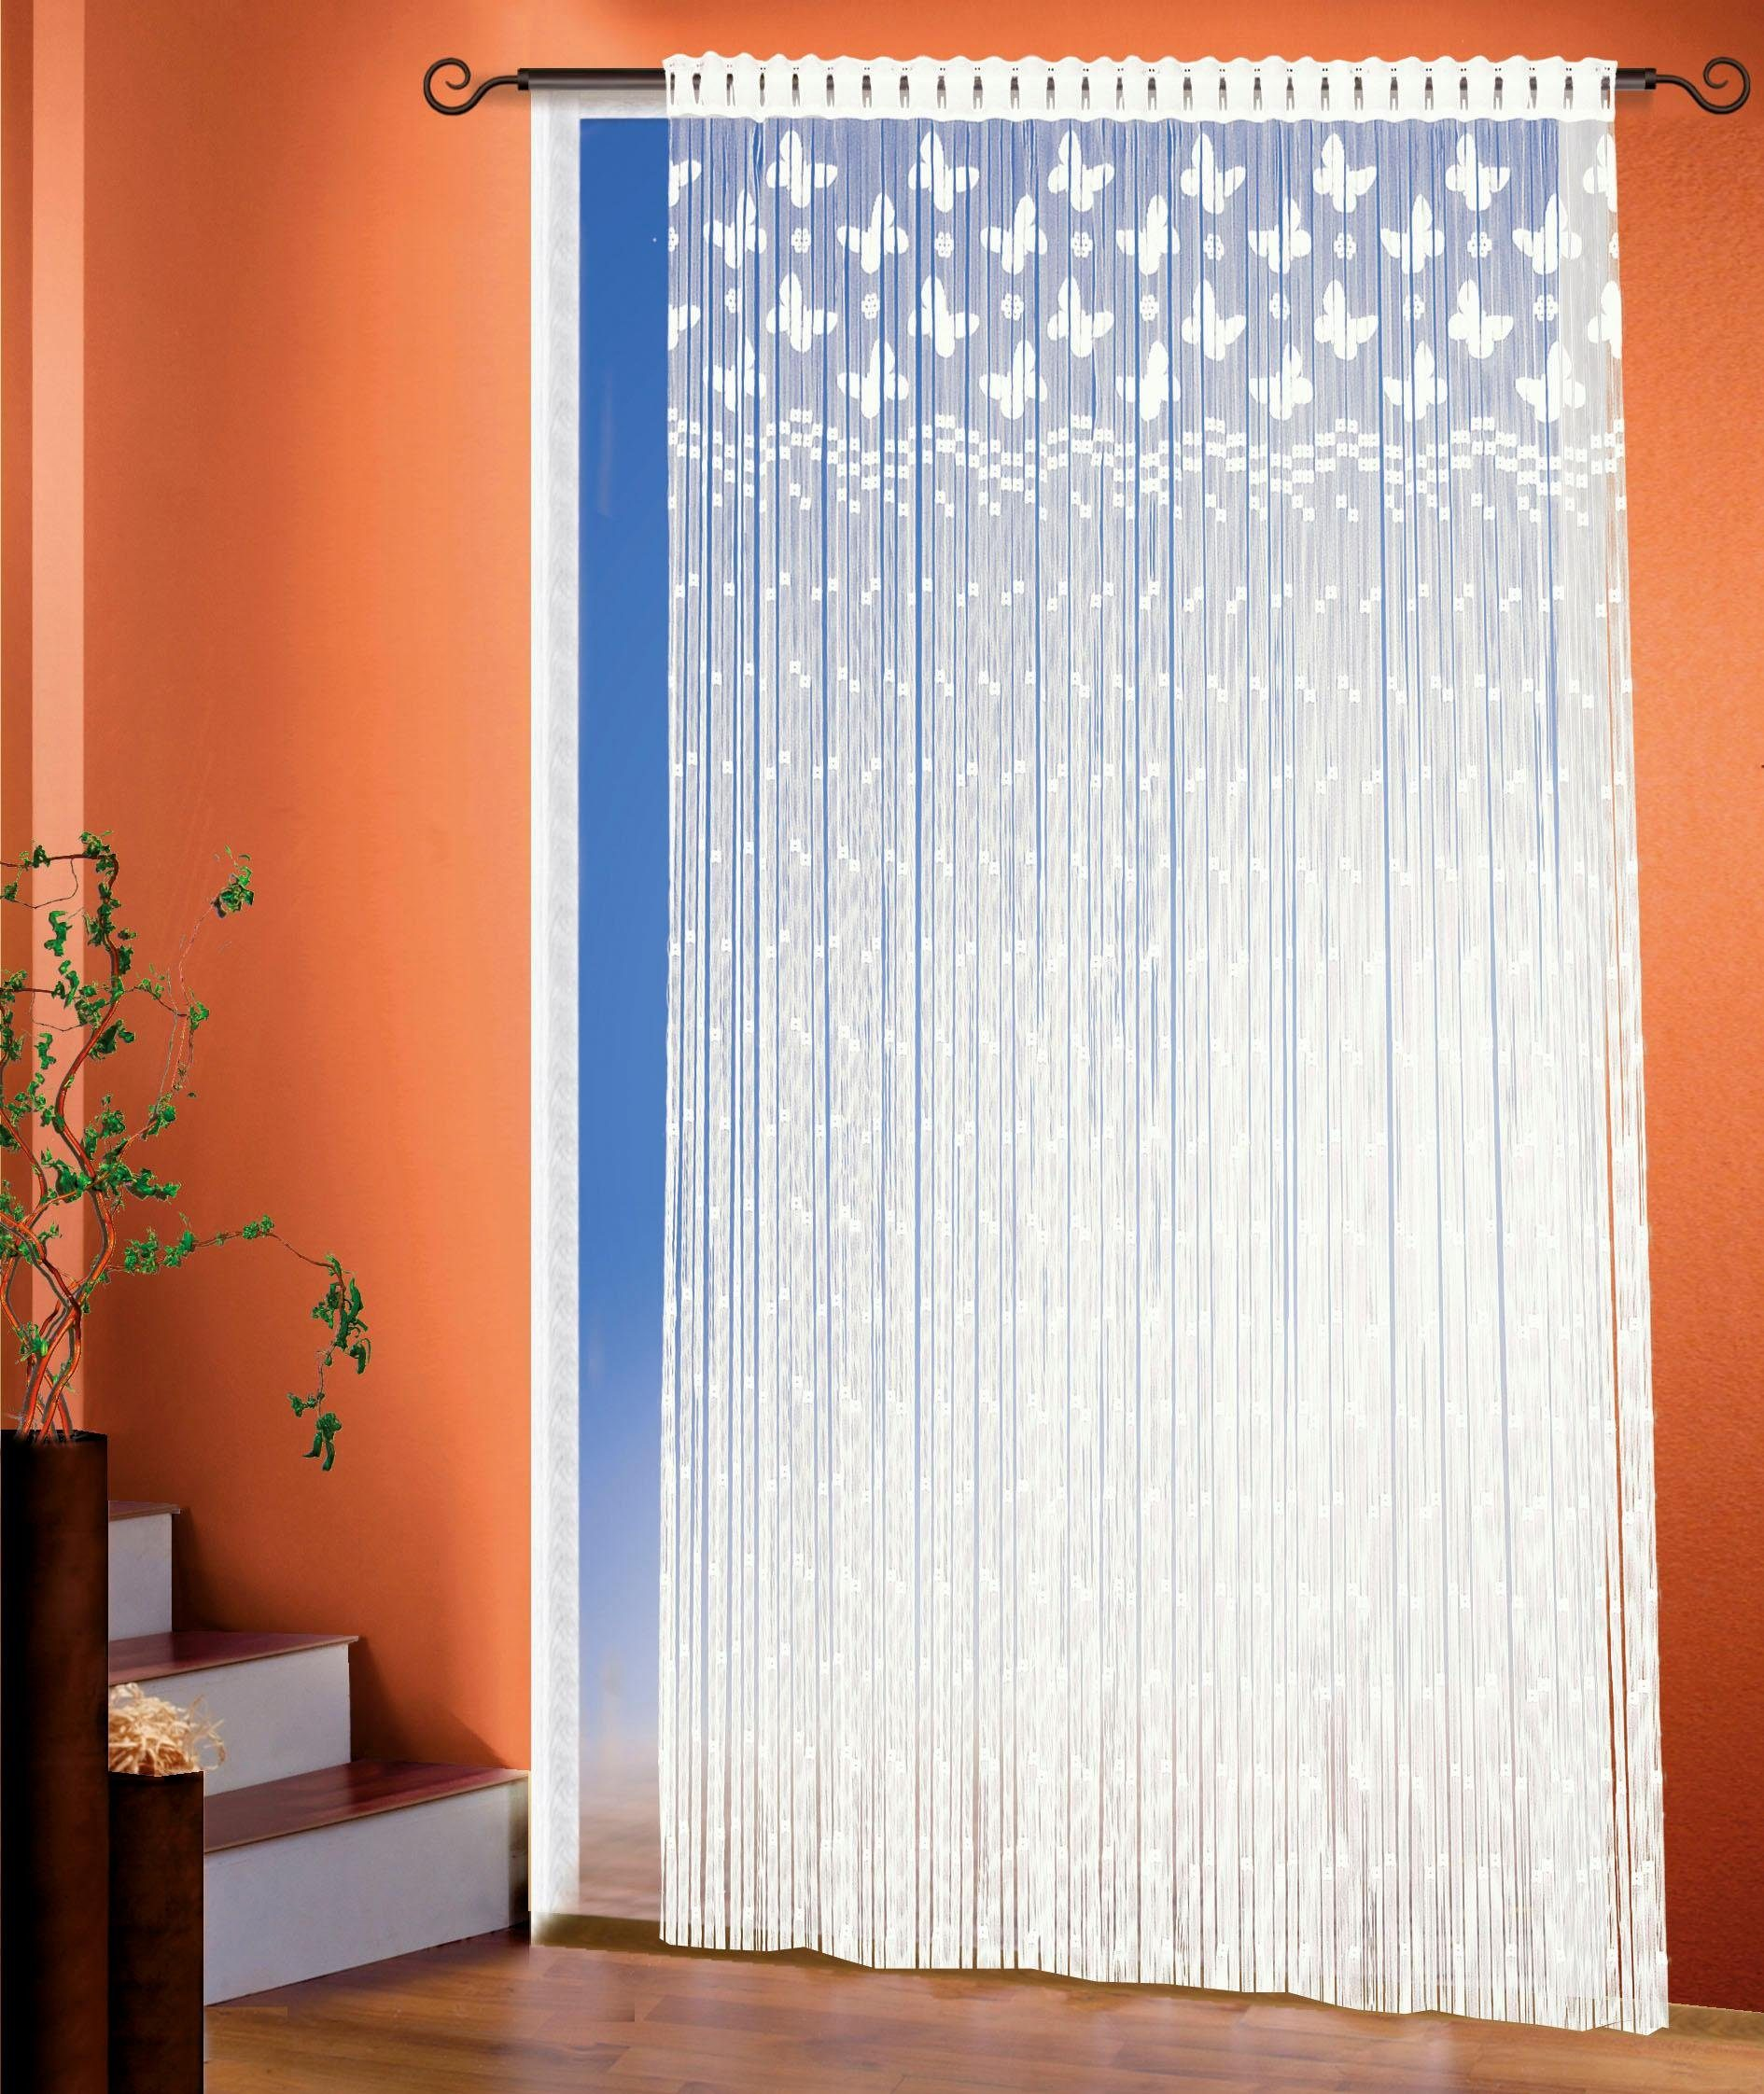 Image of Fadenvorhang, »Neuss«, WILLKOMMEN ZUHAUSE by ALBANI GROUP, Stangendurchzug 1 Stück